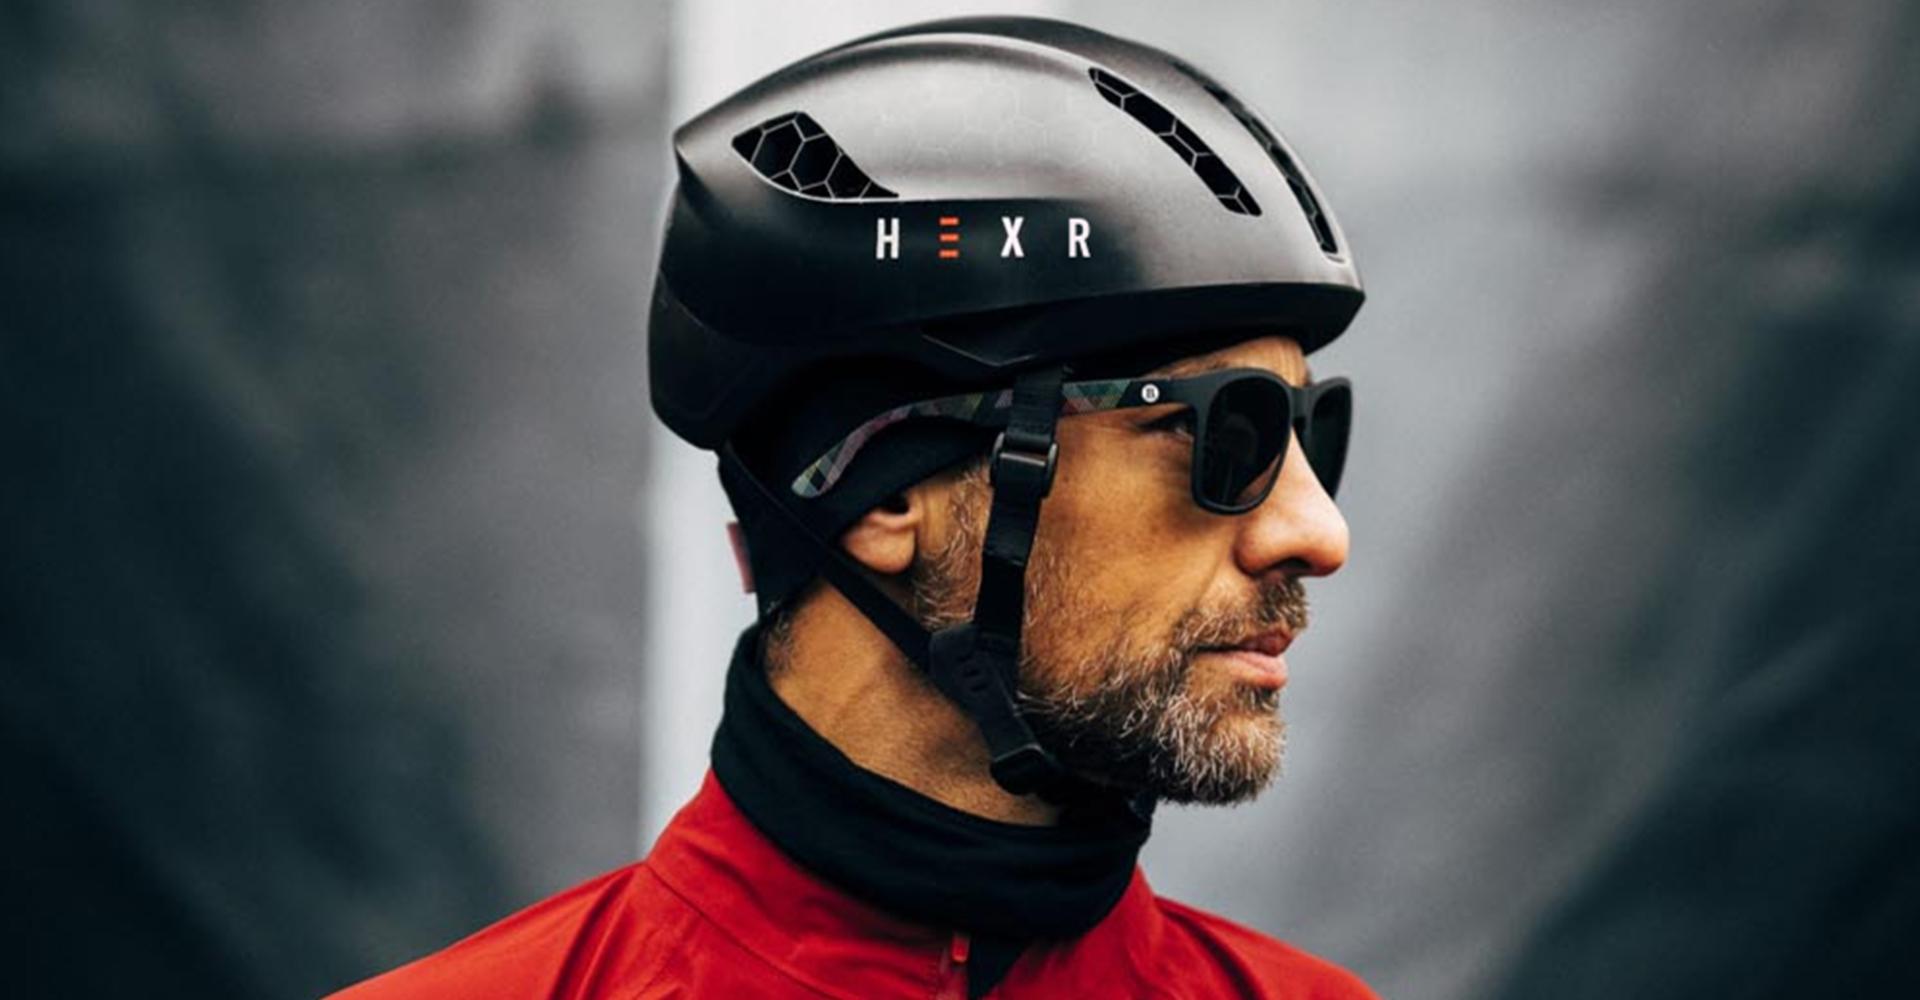 Hexr - helmet - photography - black - curventa - design - model - cycling - performance - transparent - hex - 3D print - aero - custom - headscan - closeup - detail - fabric - material